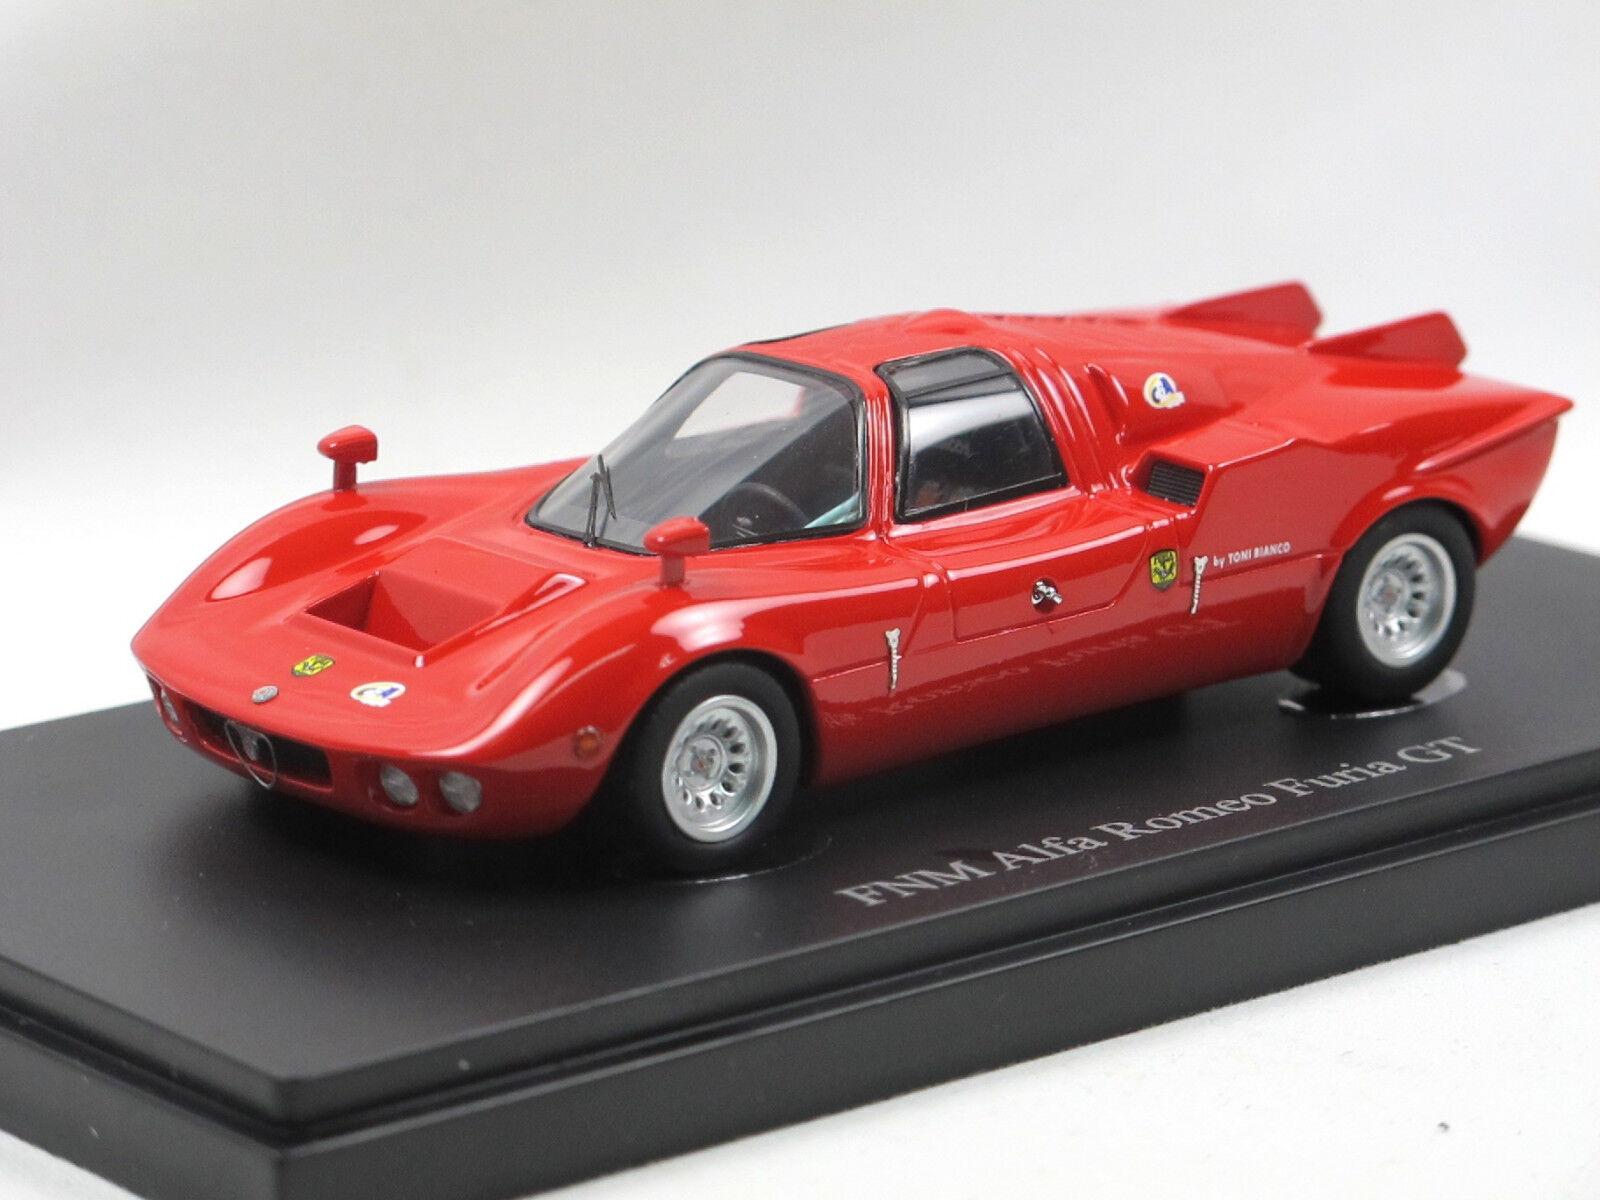 Autocult 05026 1971 fnm alfa romeo gt brasilien furia verrotten 1 43 limited edition